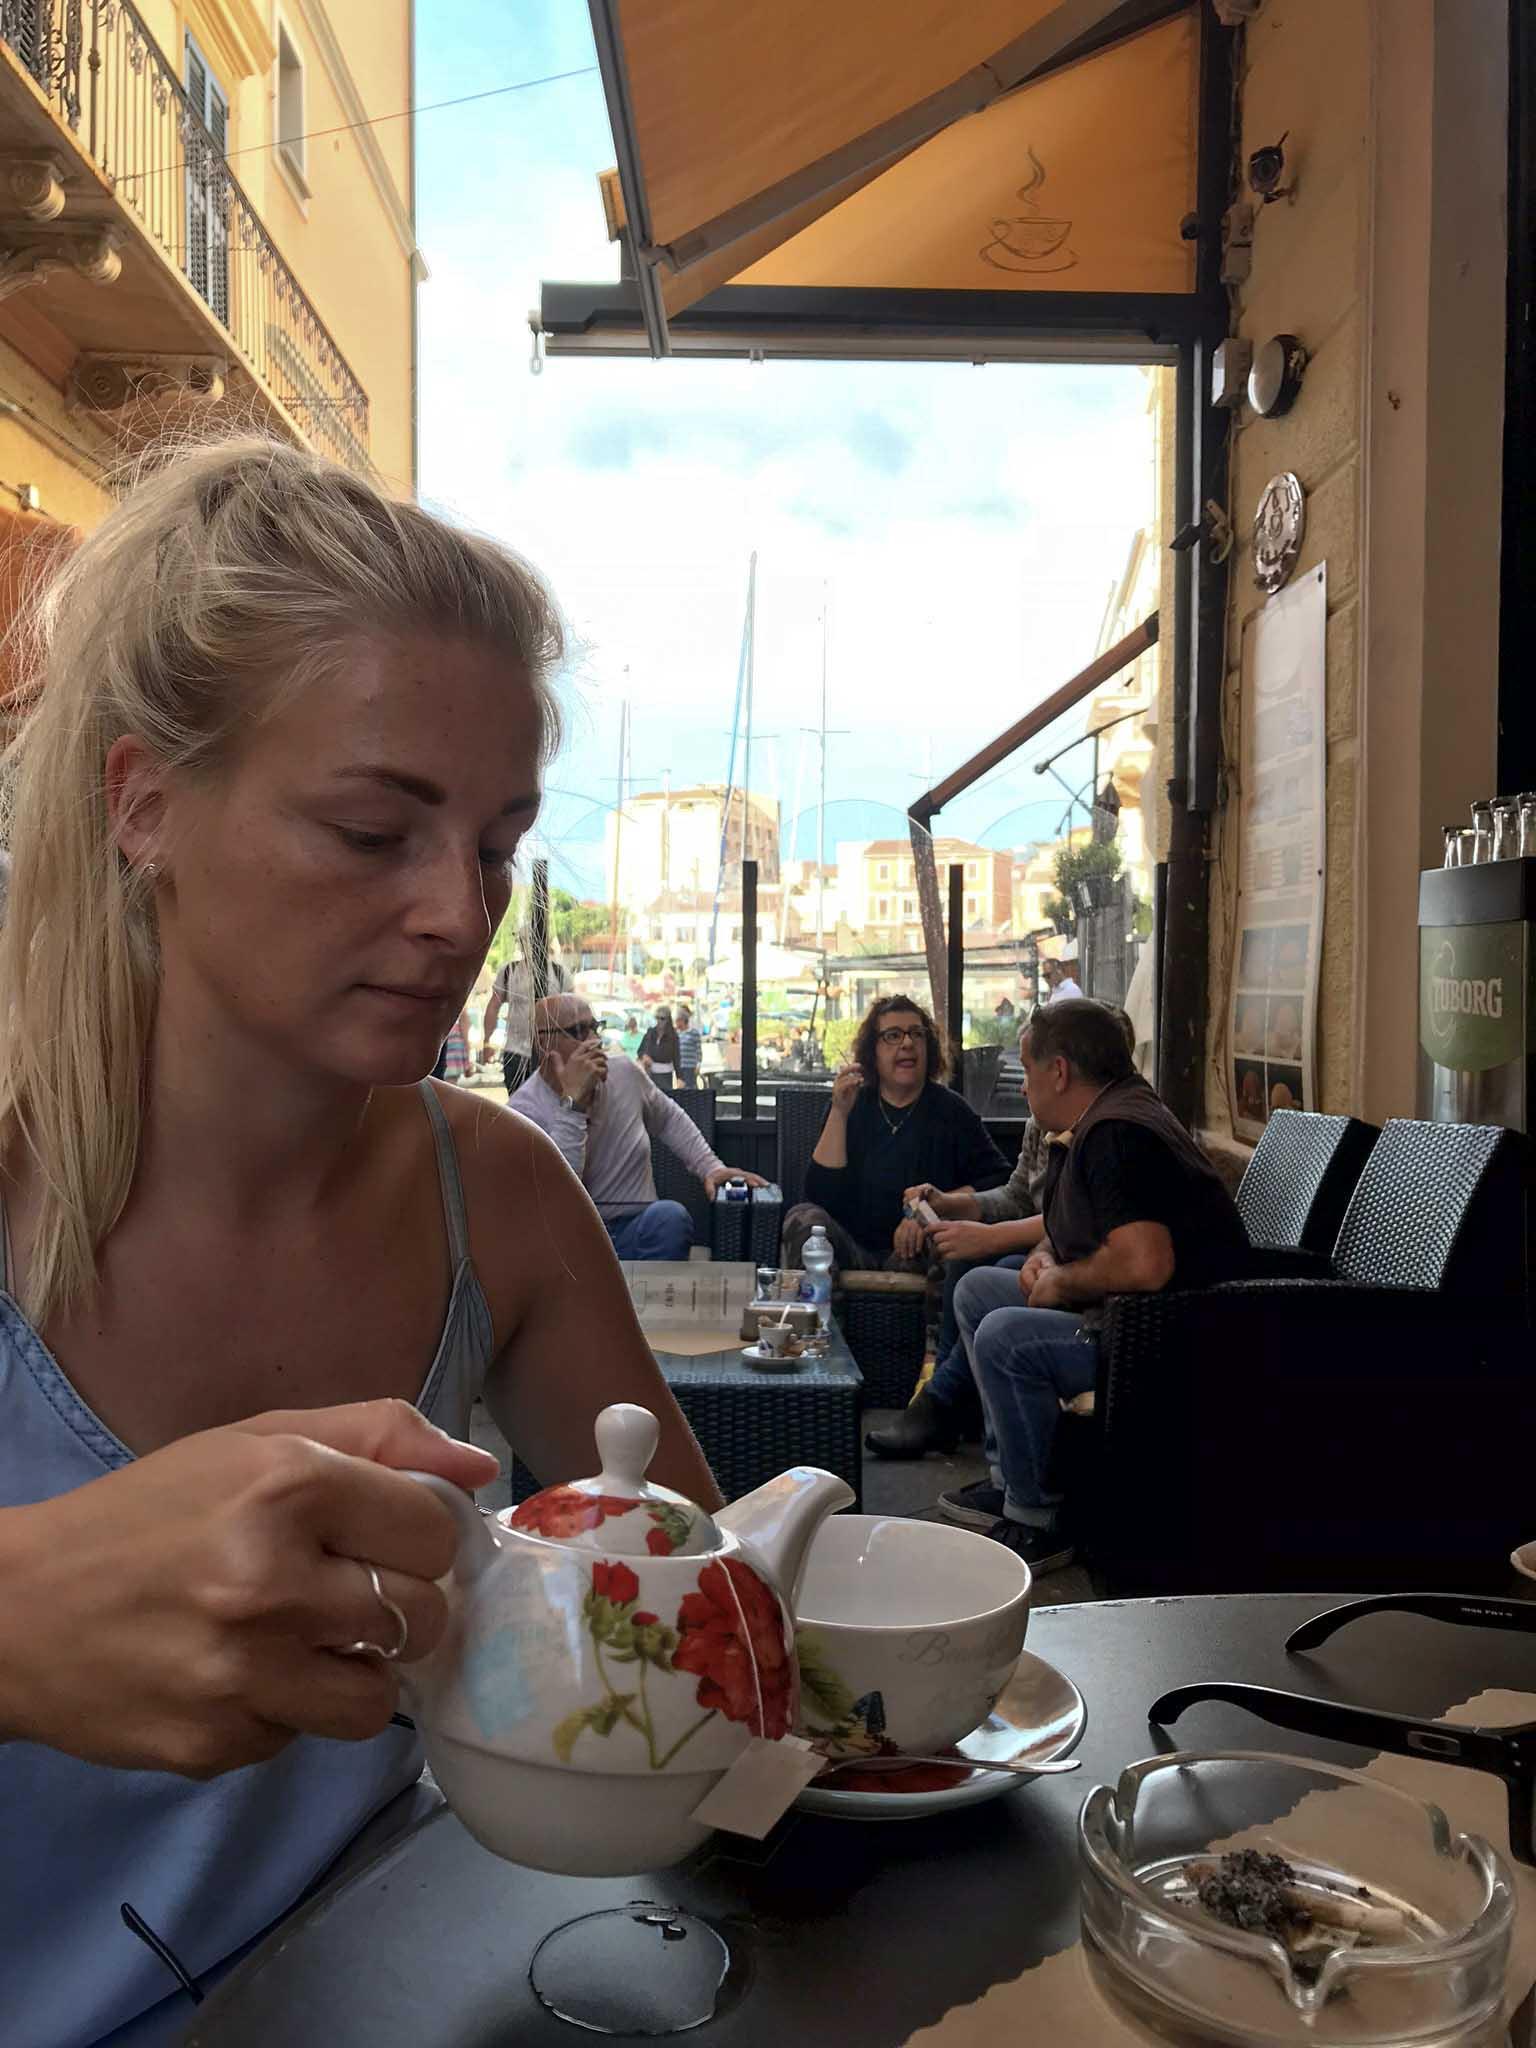 Traditionell italienische Cafés auf der Insel La Maddalena